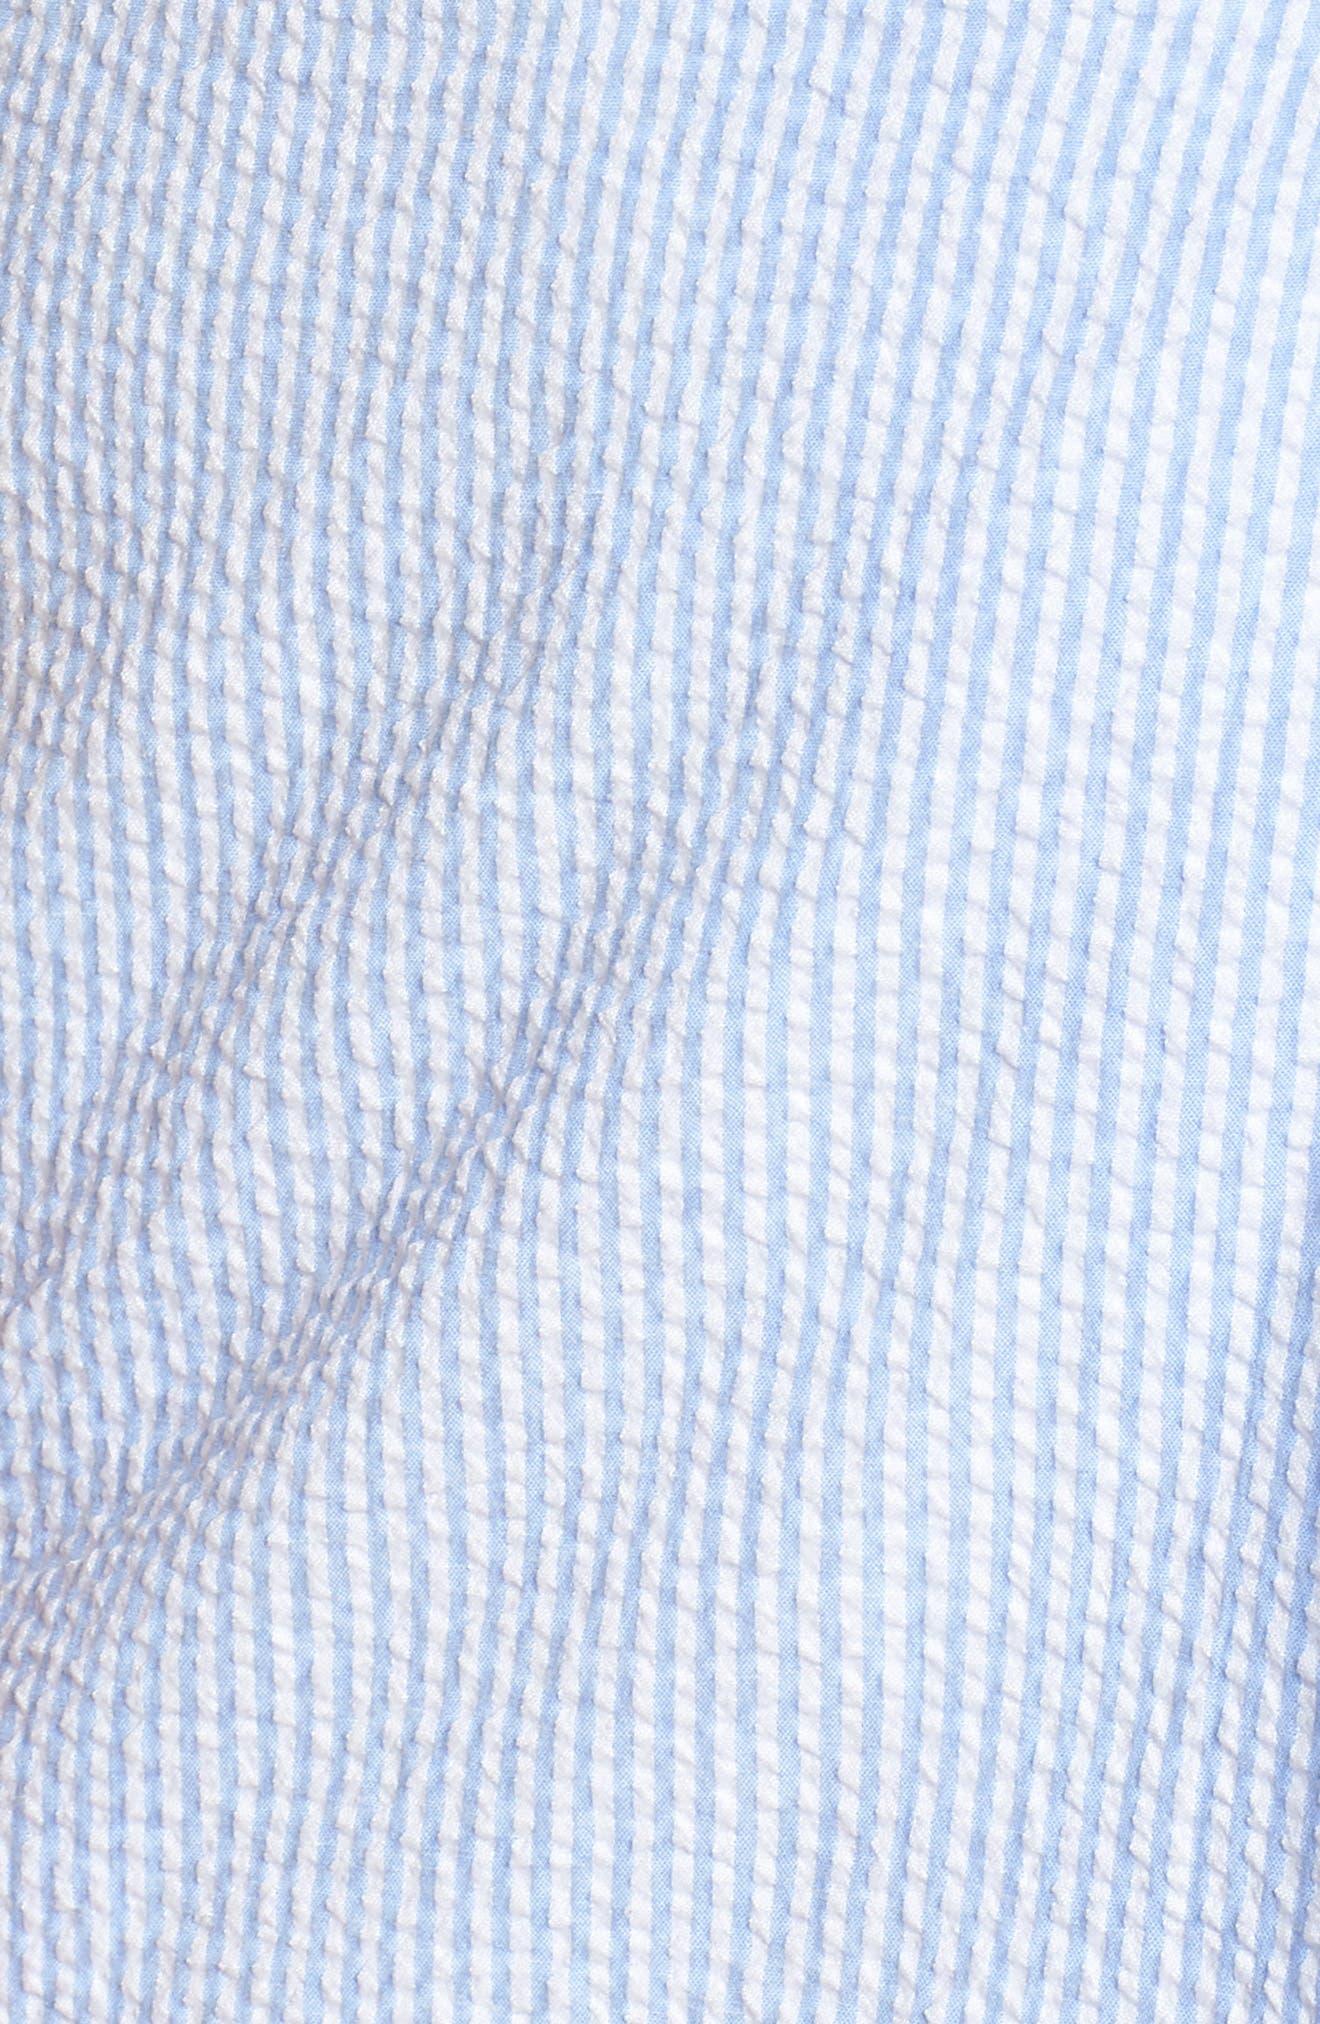 Bow Shoulder Seersucker Dress,                             Alternate thumbnail 7, color,                             Blue Seersucker Stripe